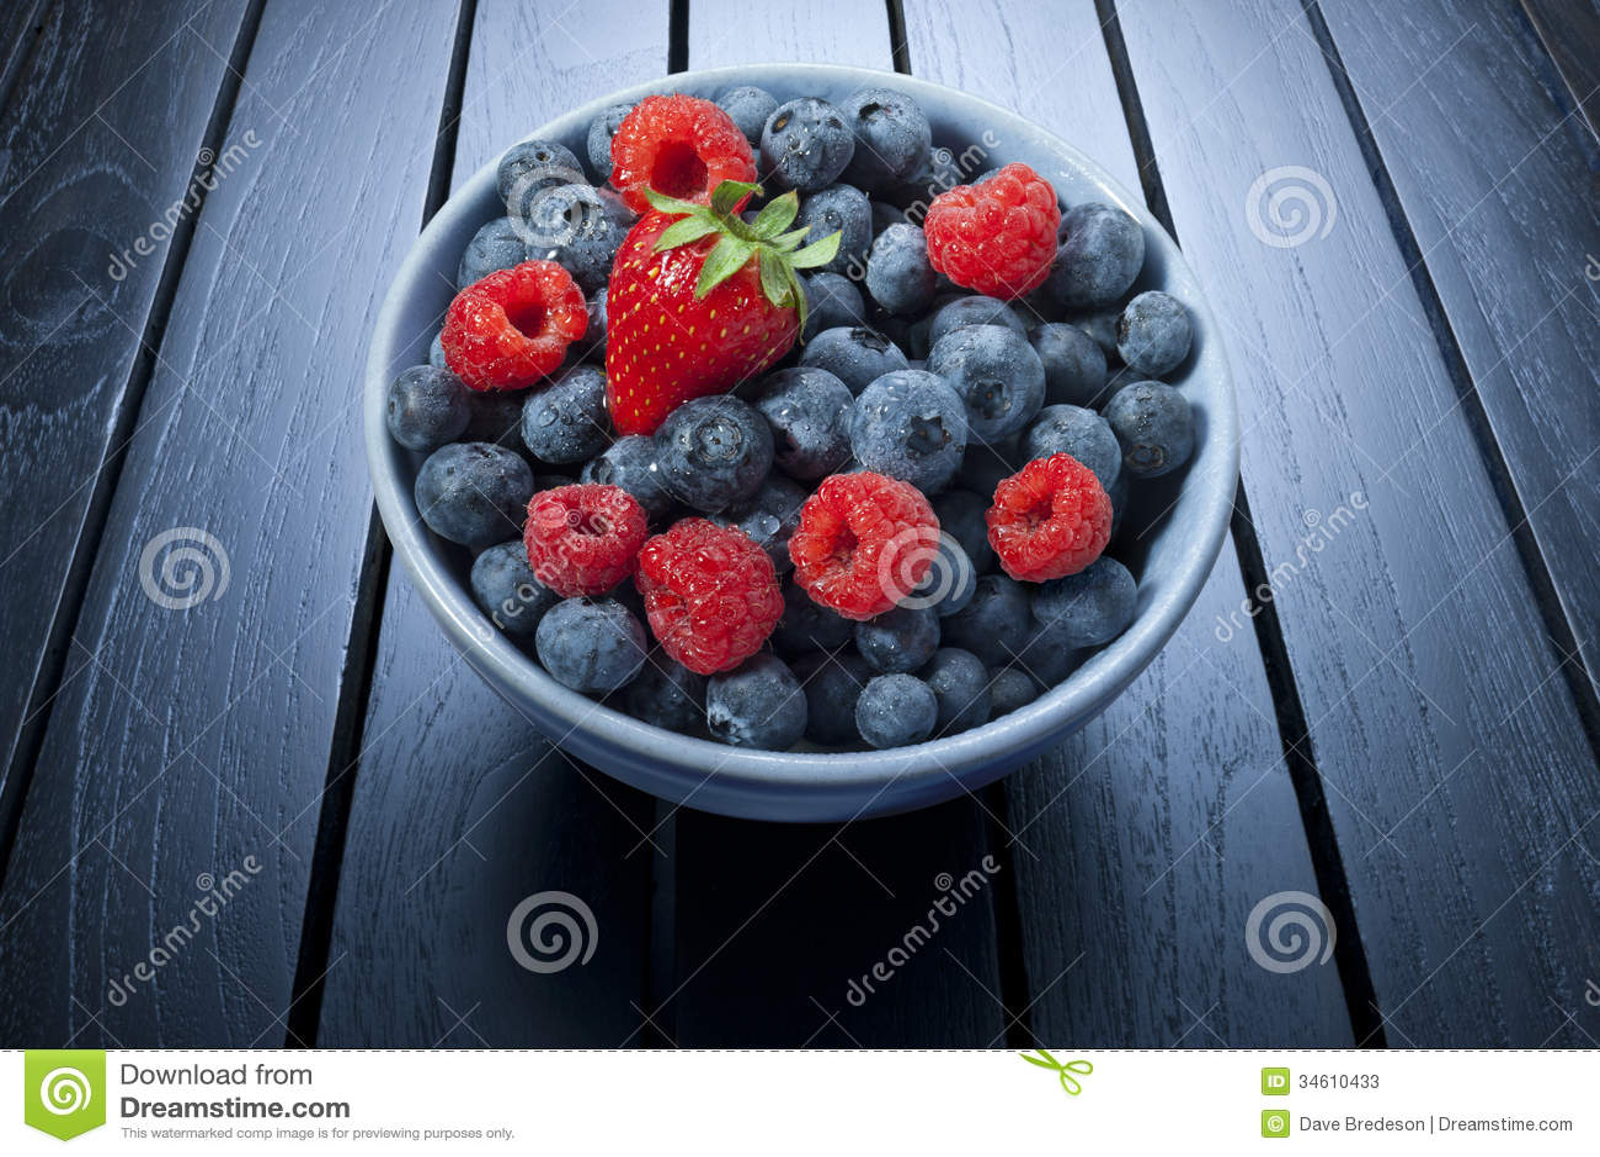 Bowl Of Summer Berries